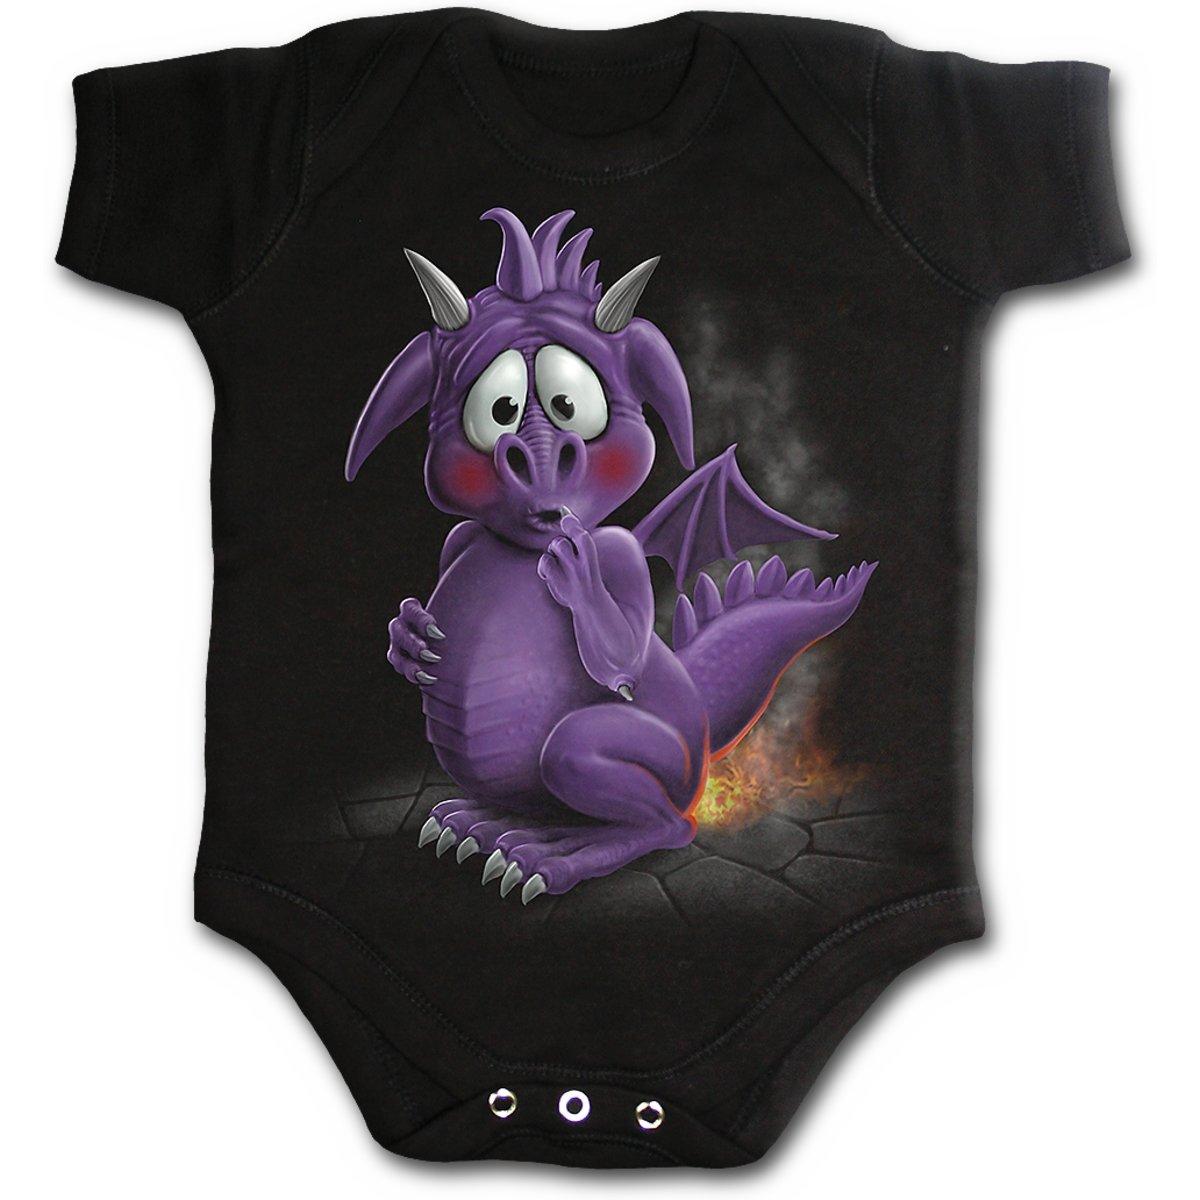 Spiral Baby-Boys - Dragon Relief - Baby Sleepsuit Black K002F017